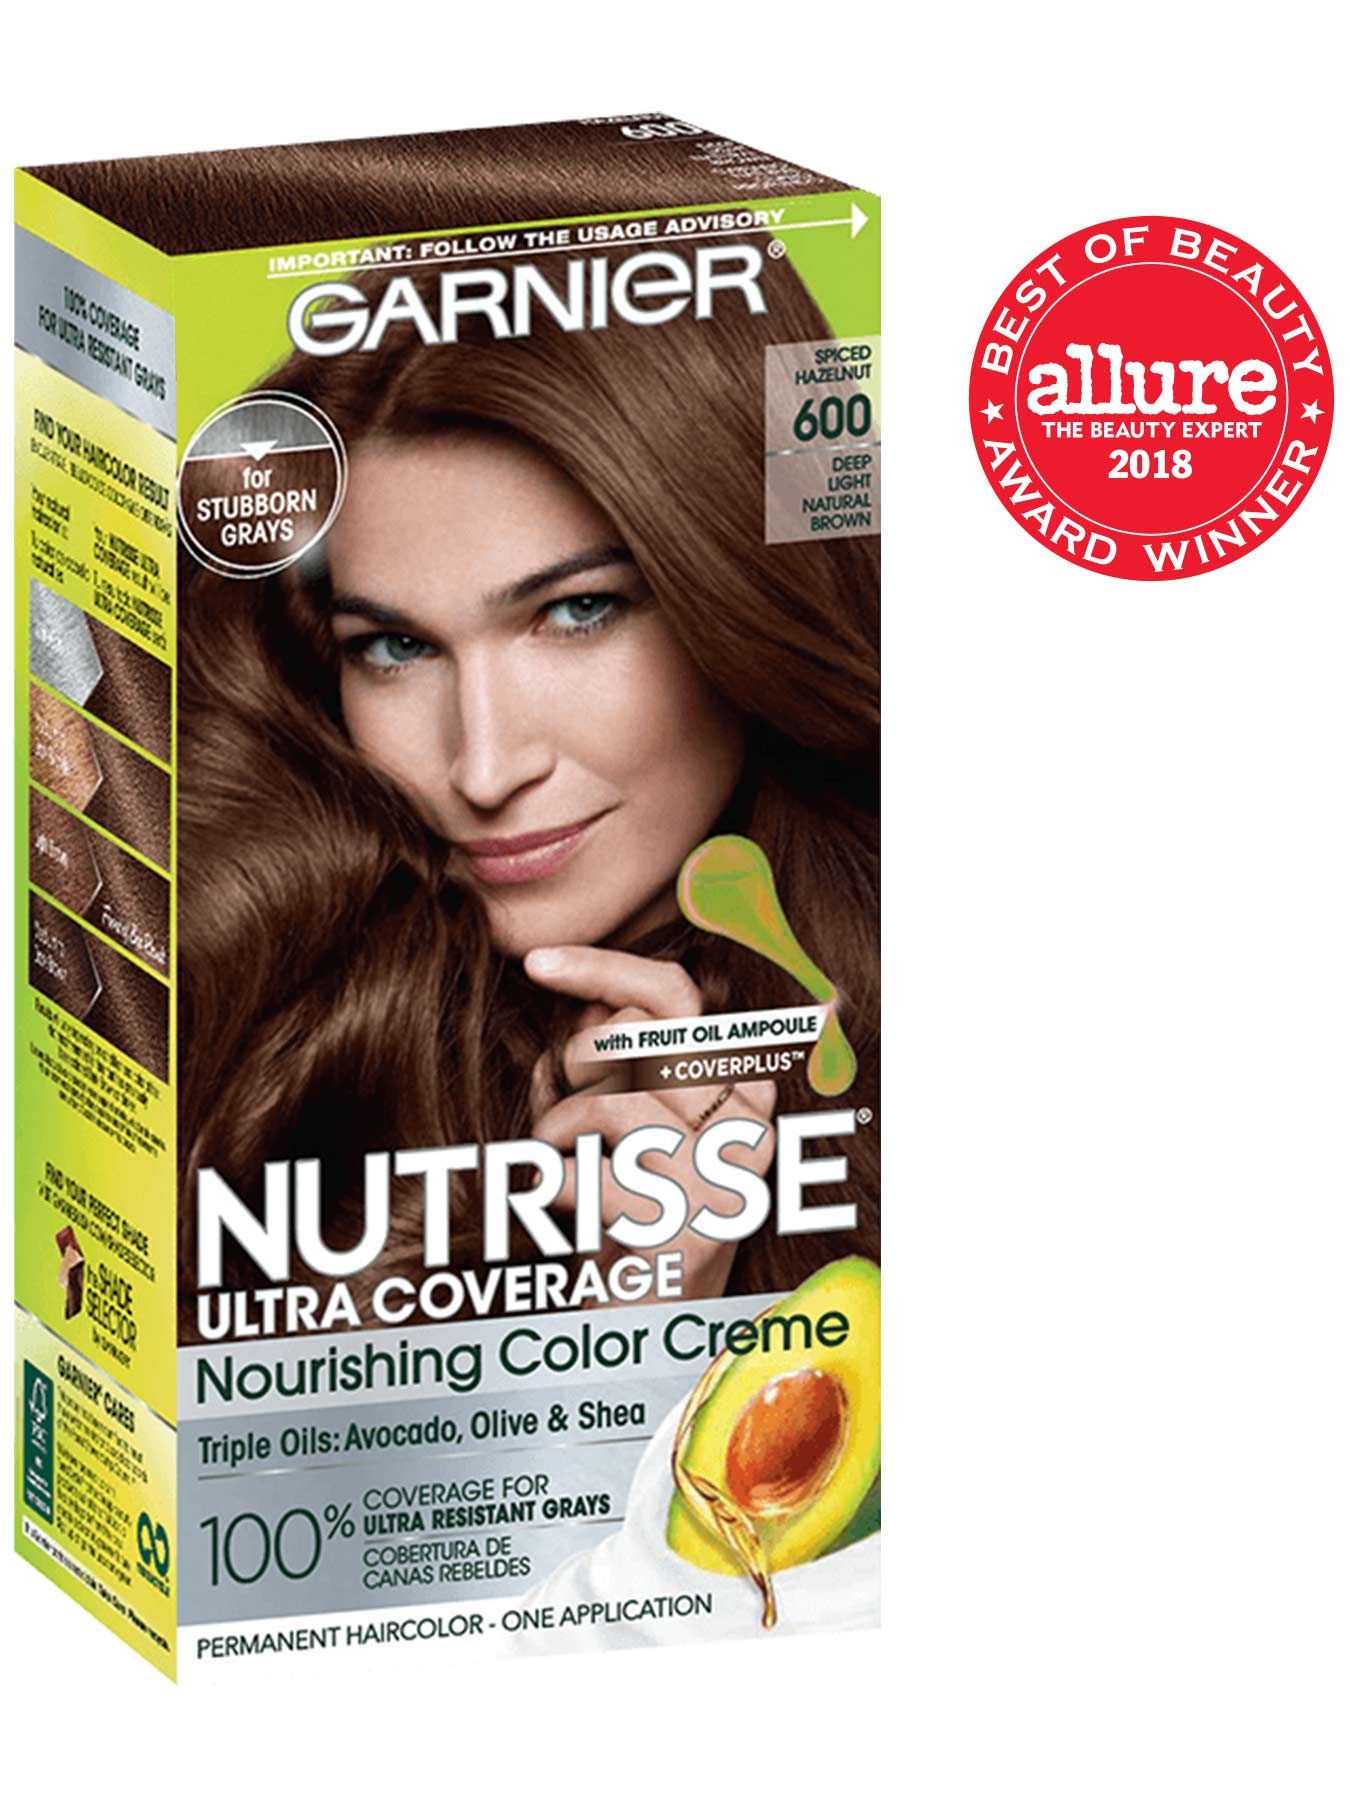 Garnier Nutrisse Ultra Coverage Hair Color Ultra Nutrisse Garnier Garnier Hair Color Hair Color Light Brown Hair Color